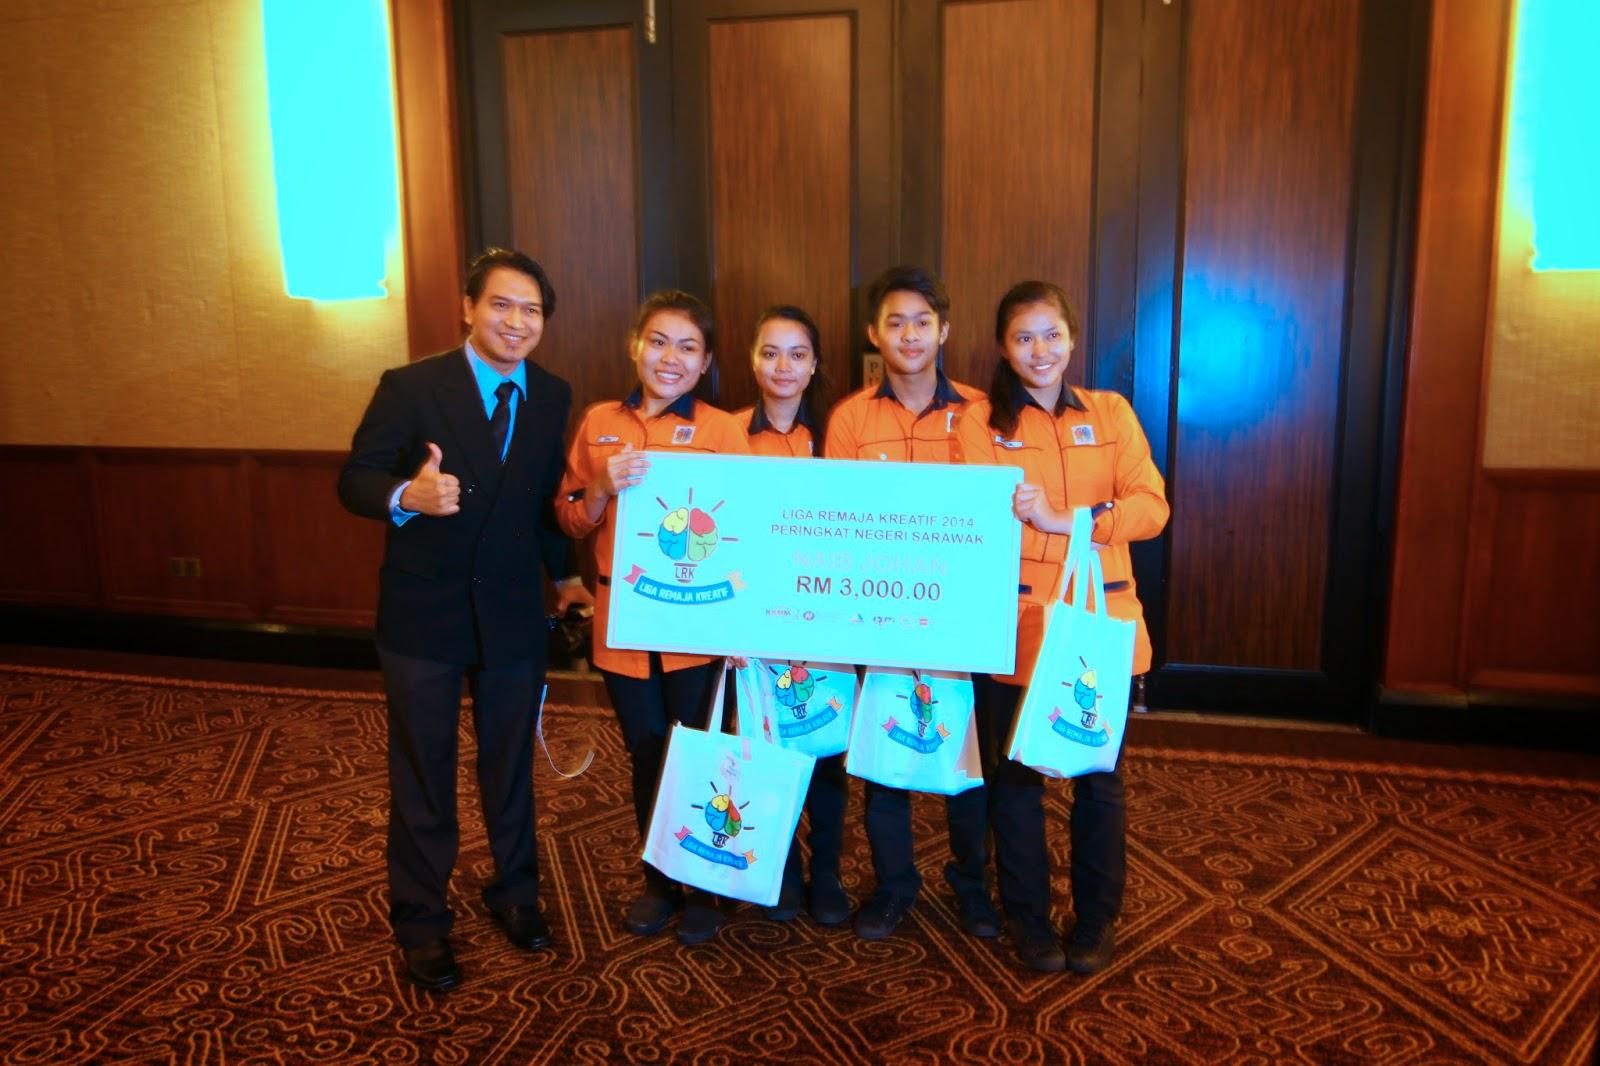 Liga Remaja Kreatif 2014 (Zon Sarawak) KOLEJ VOKASIONAL BINTULU!